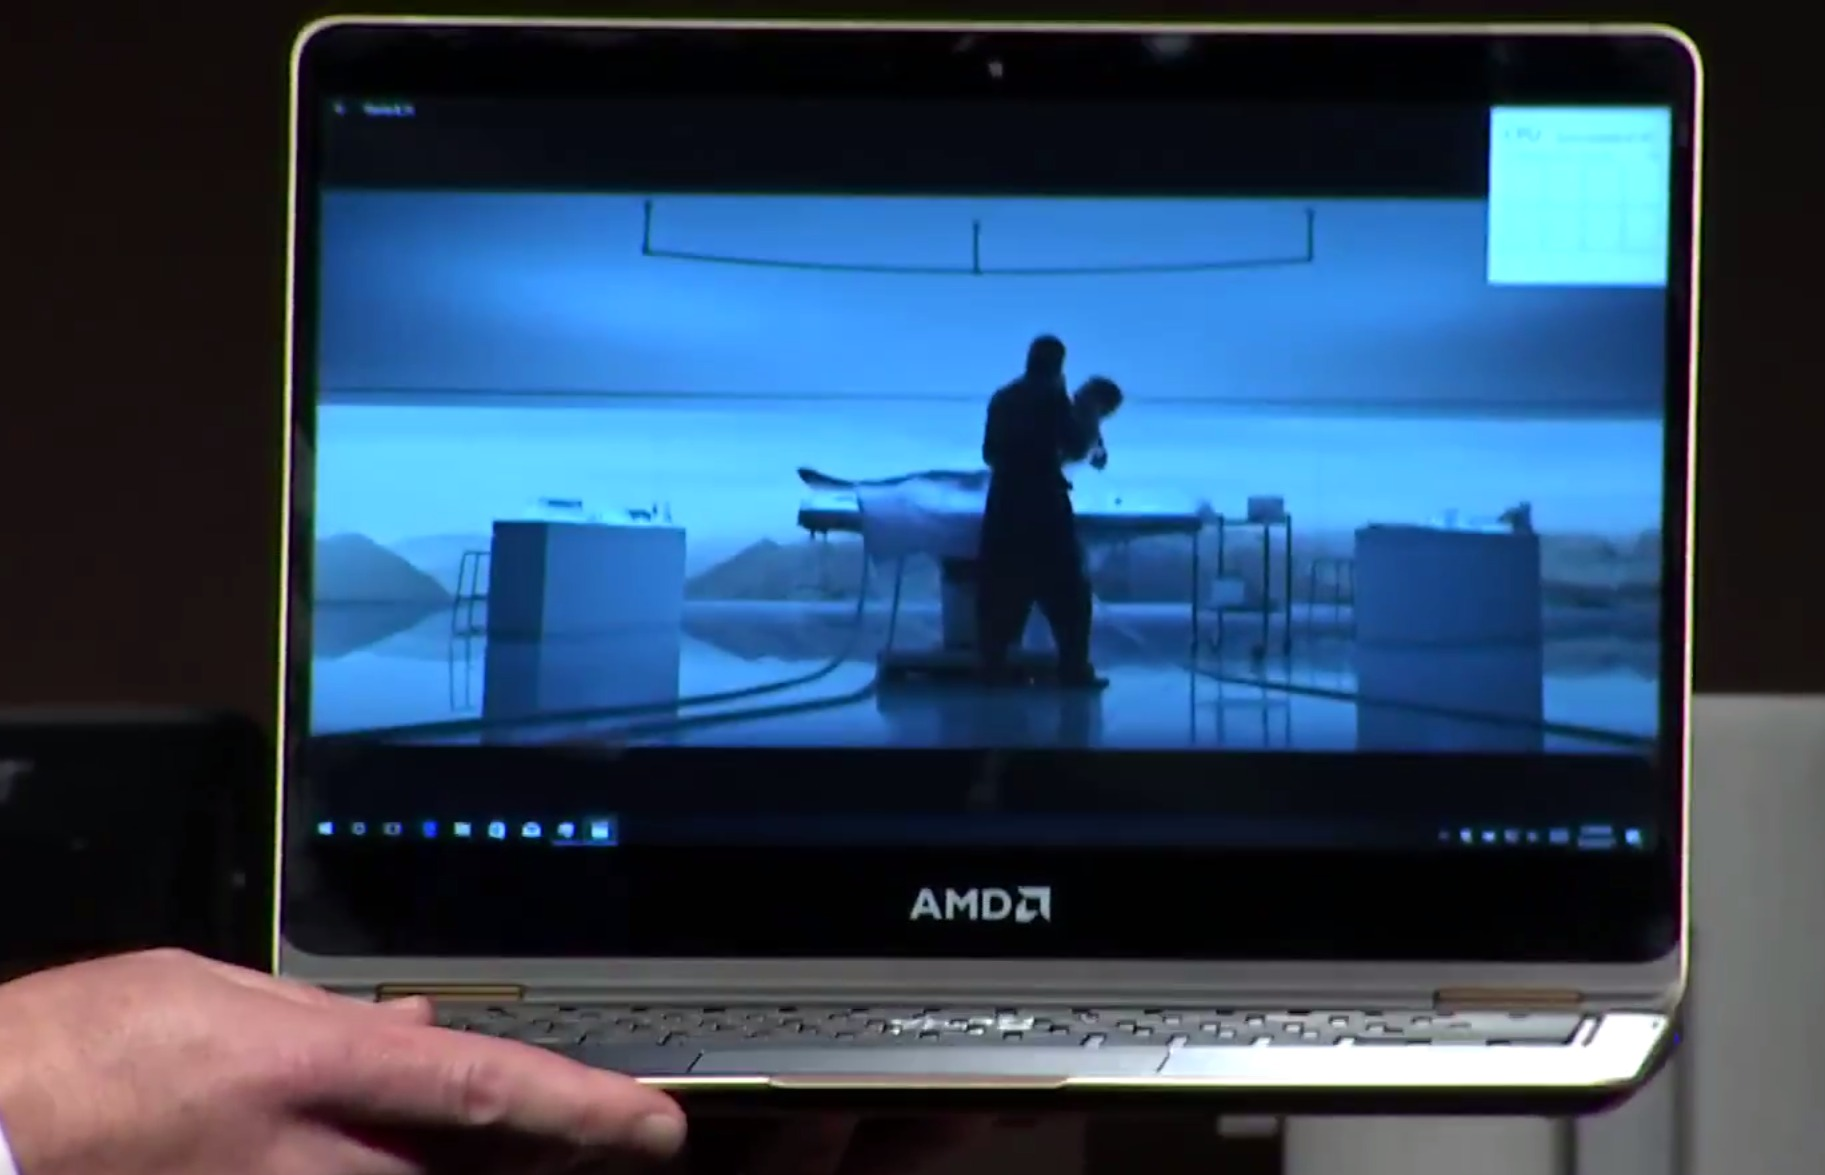 AMD의 라이젠 기반 모바일 칩을 탑재한 노트북. 쿼드코어 라이젠 CPU과 라데온 그래픽을 하나의 칩으로 통합했다.